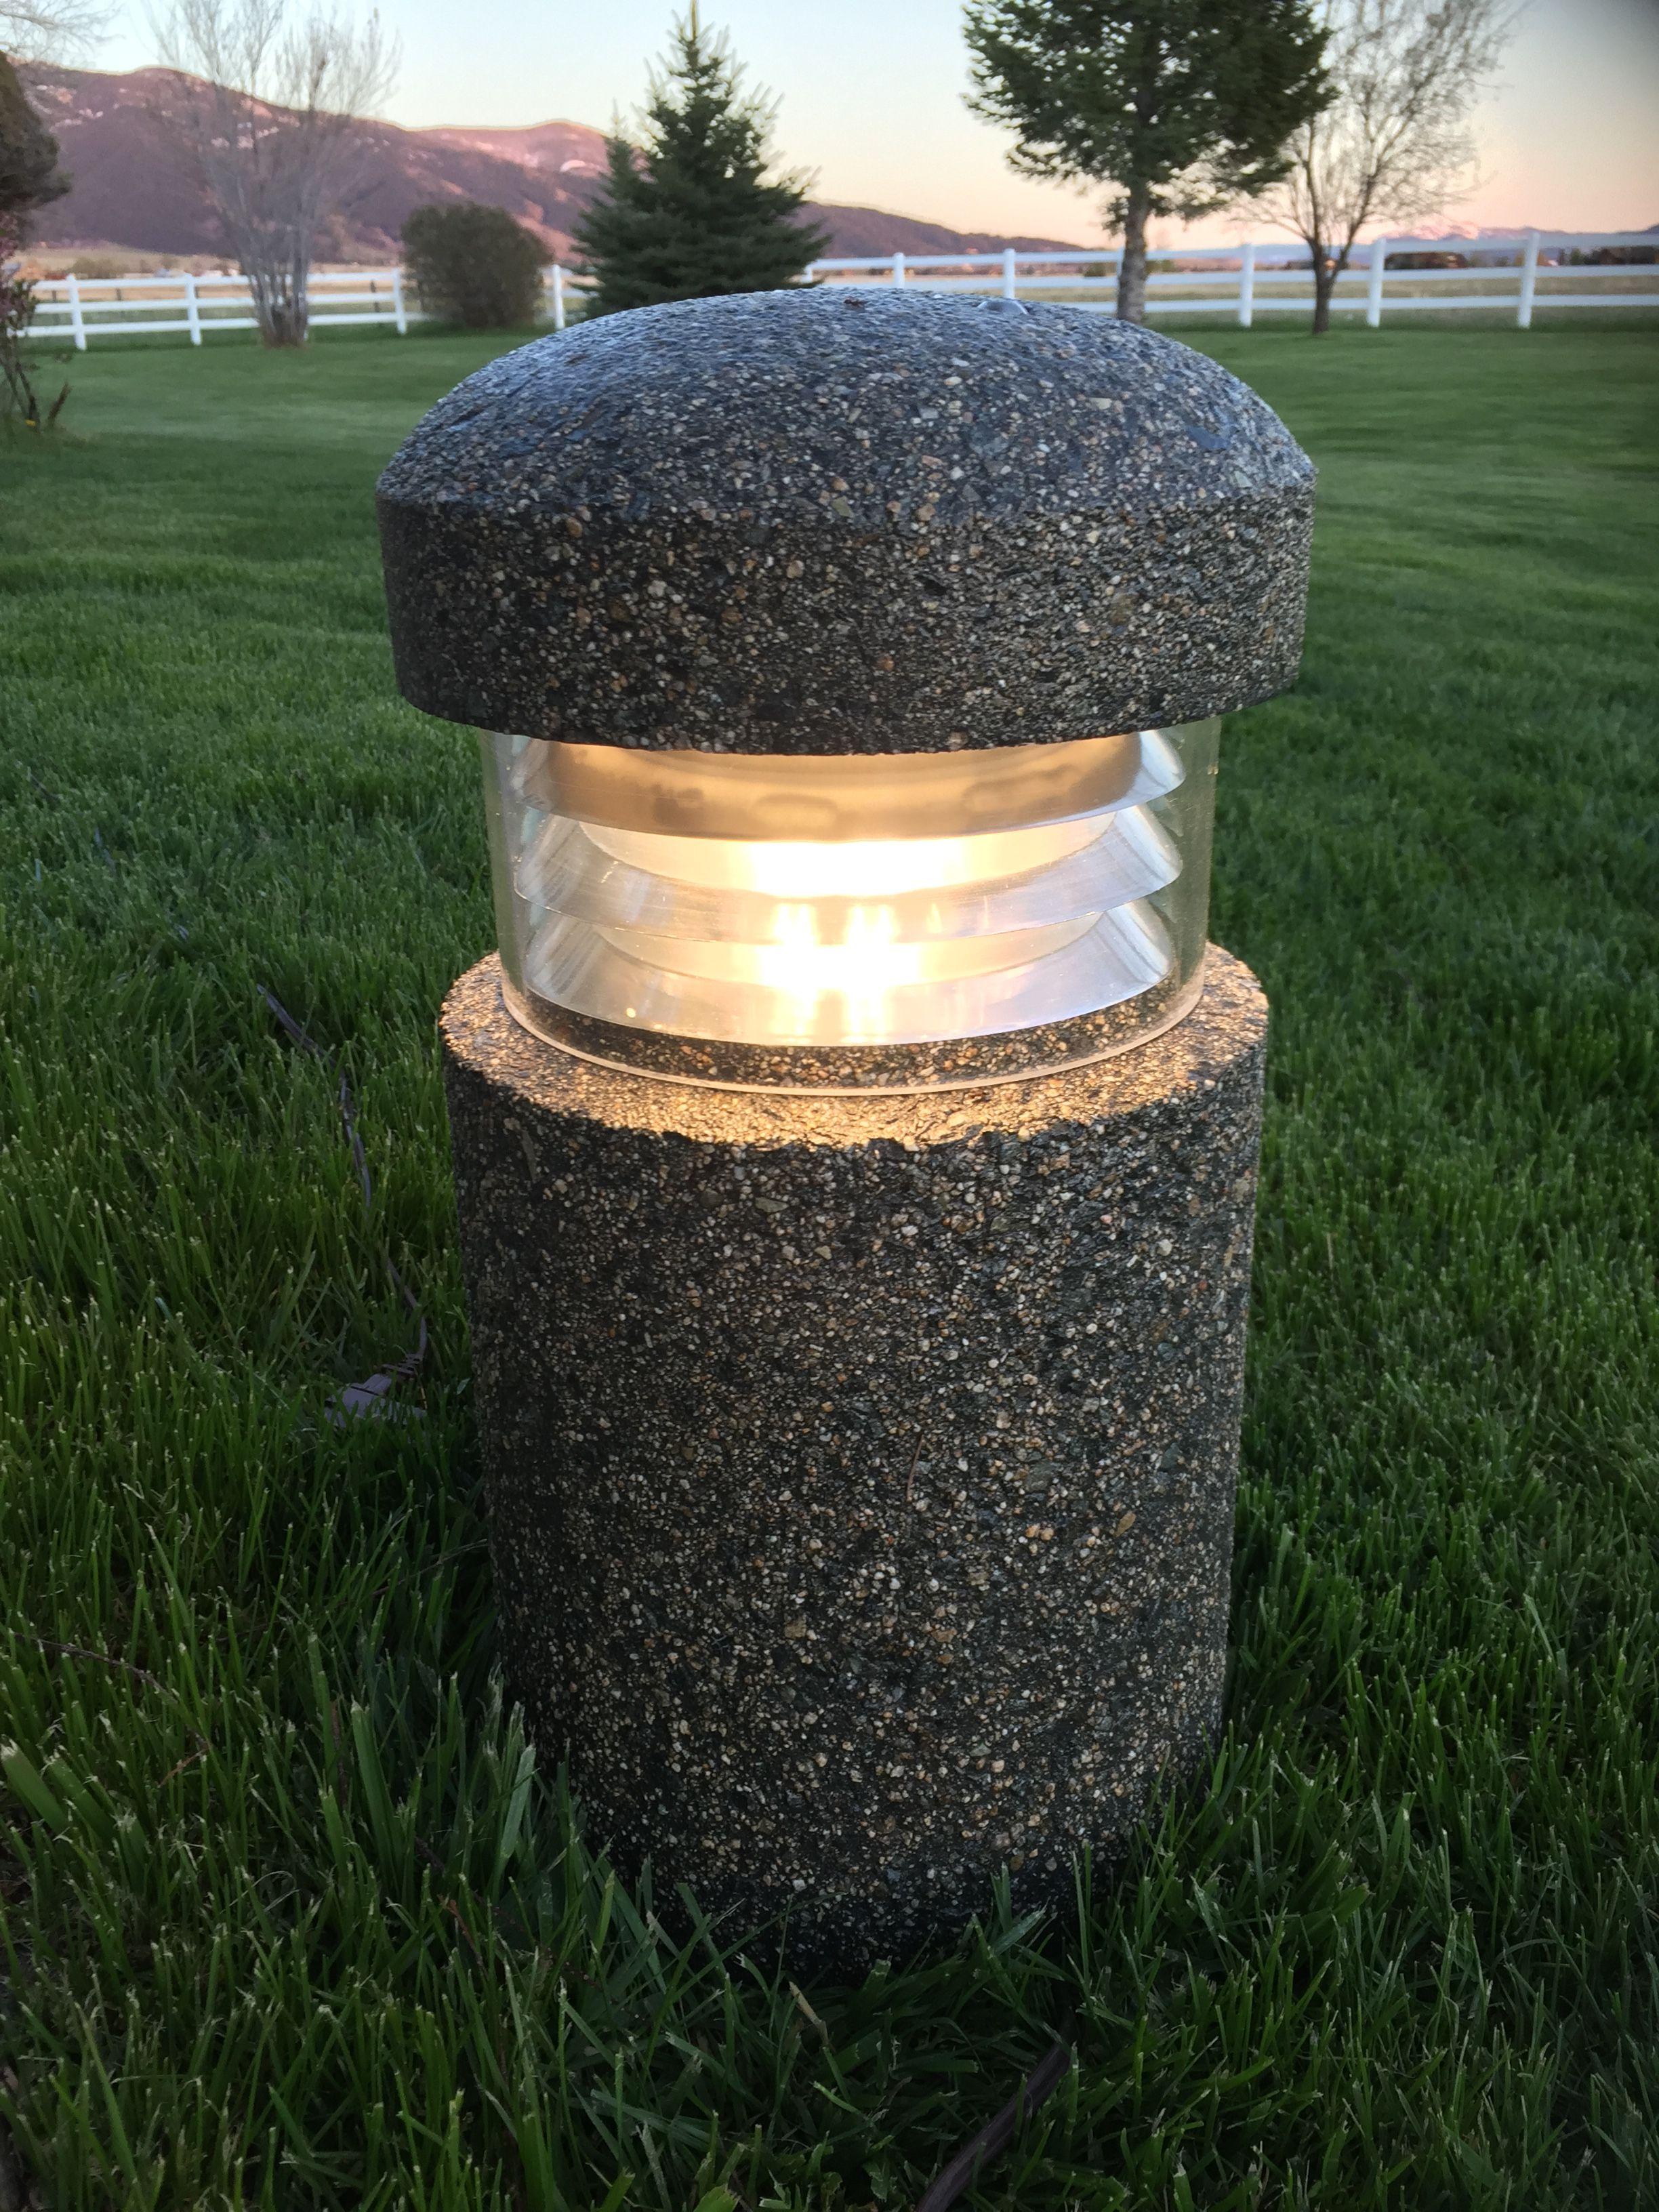 Paradise Garden Lighting 10W Cast Aluminum Mushroom Head